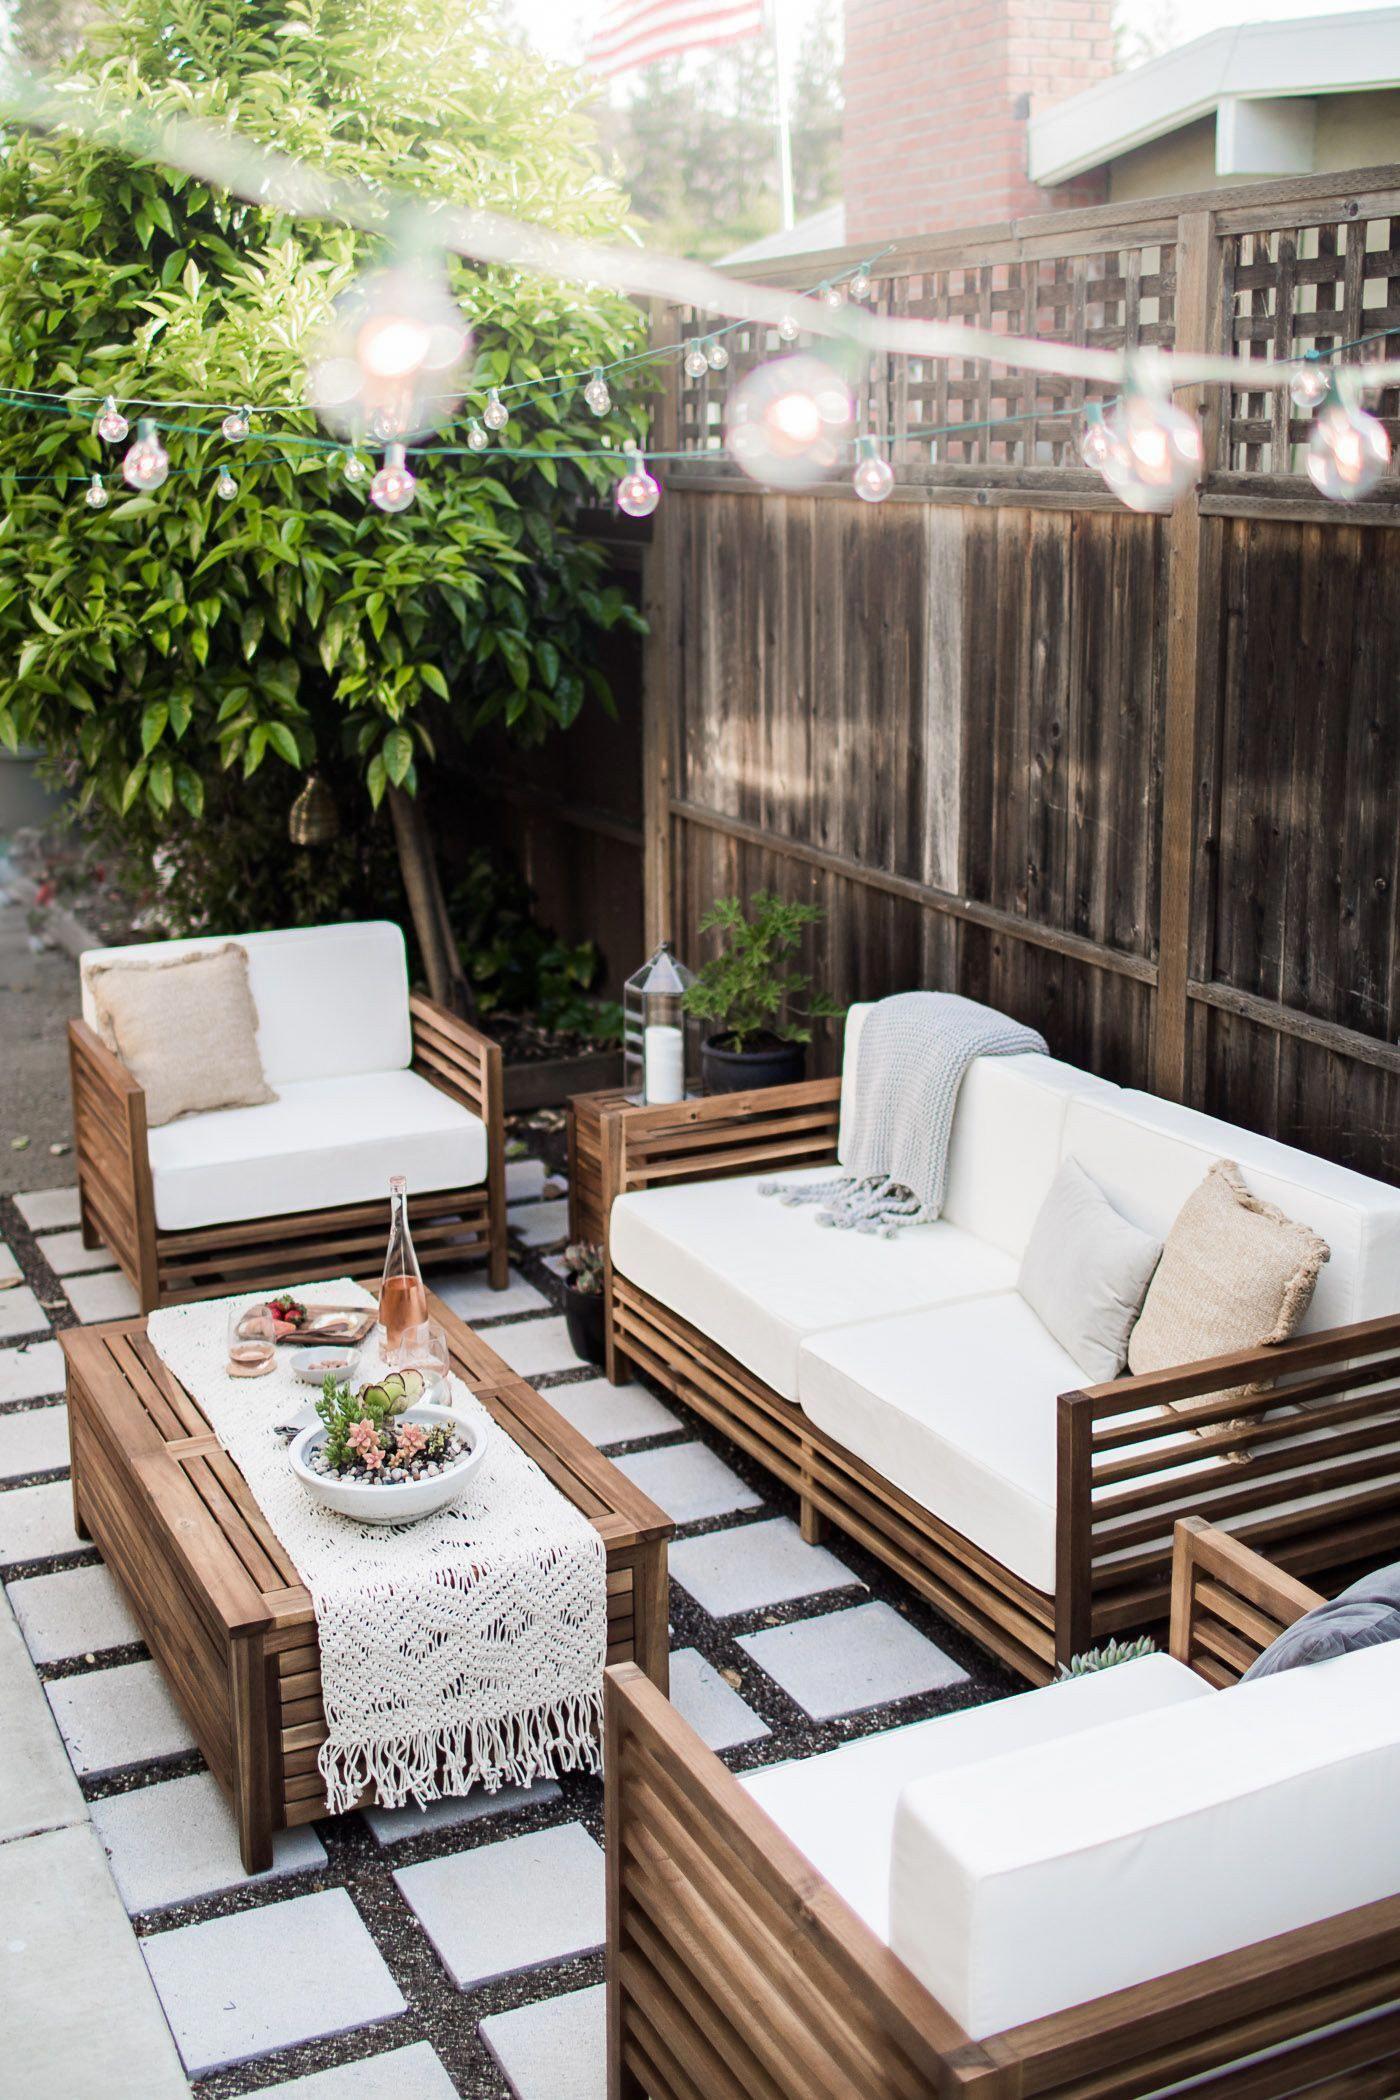 Living room furniture design decor themes home interior also rh in pinterest